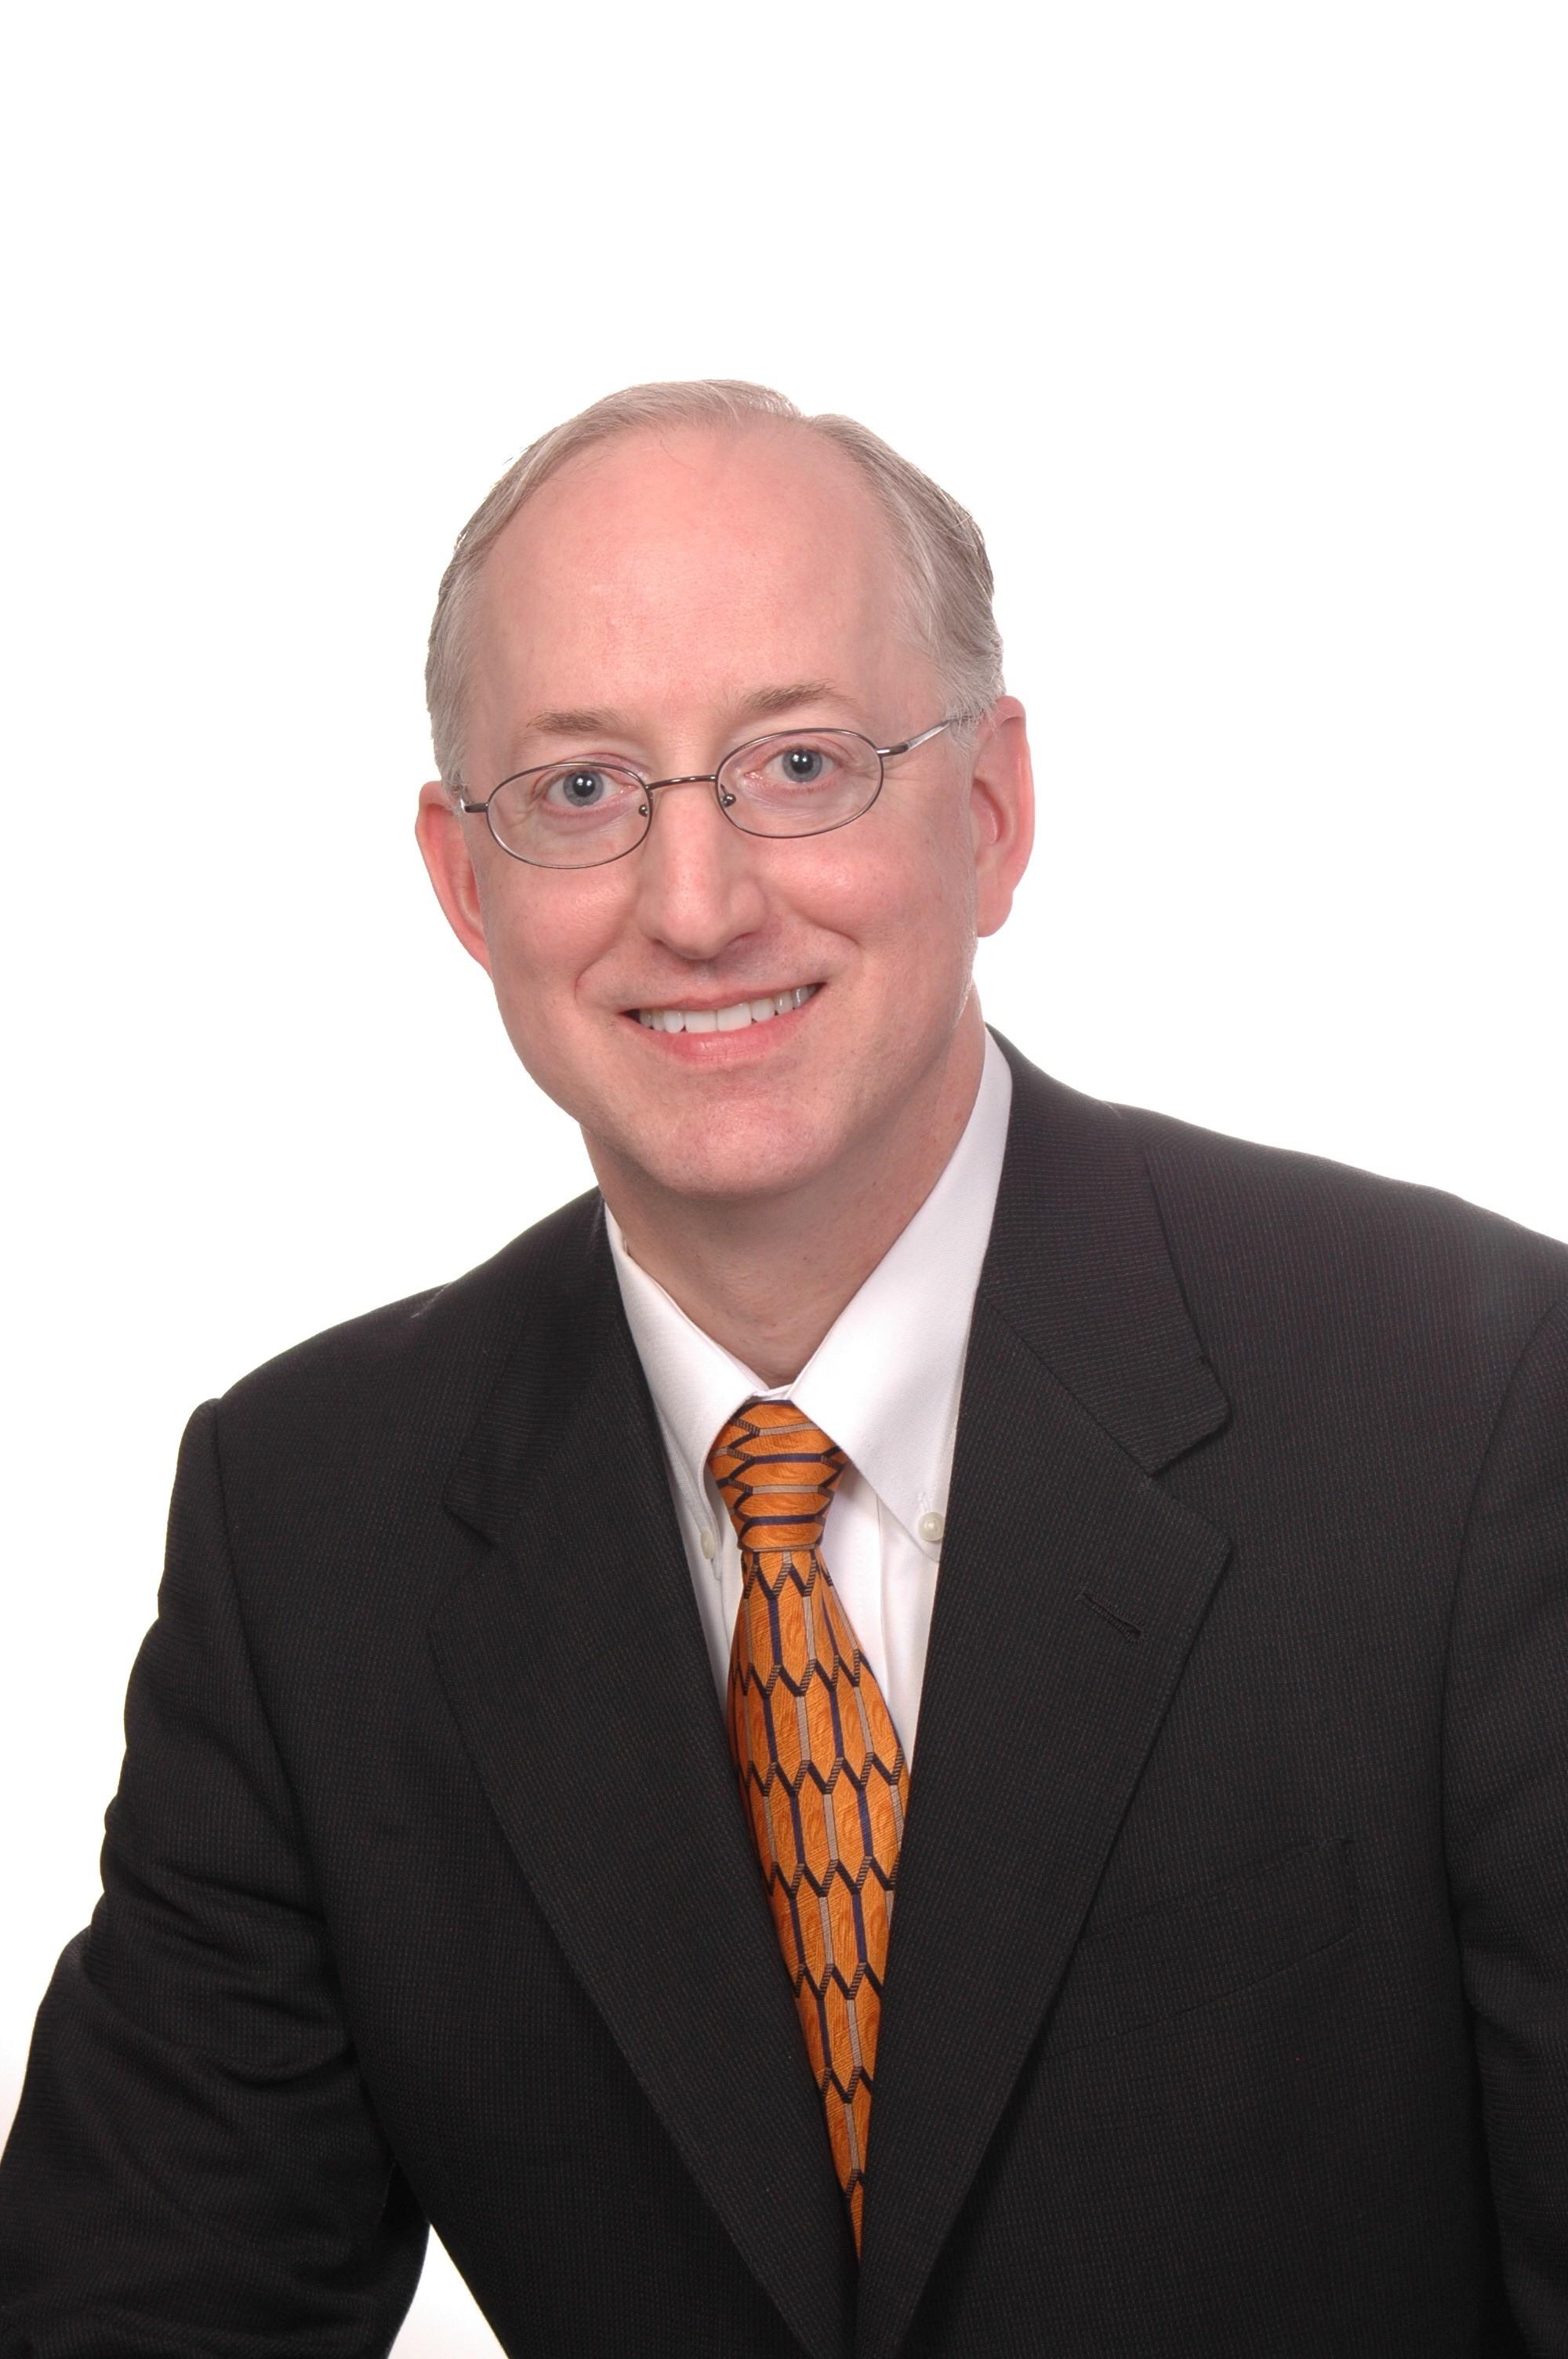 John Frymire, financial advisor Louisville KY